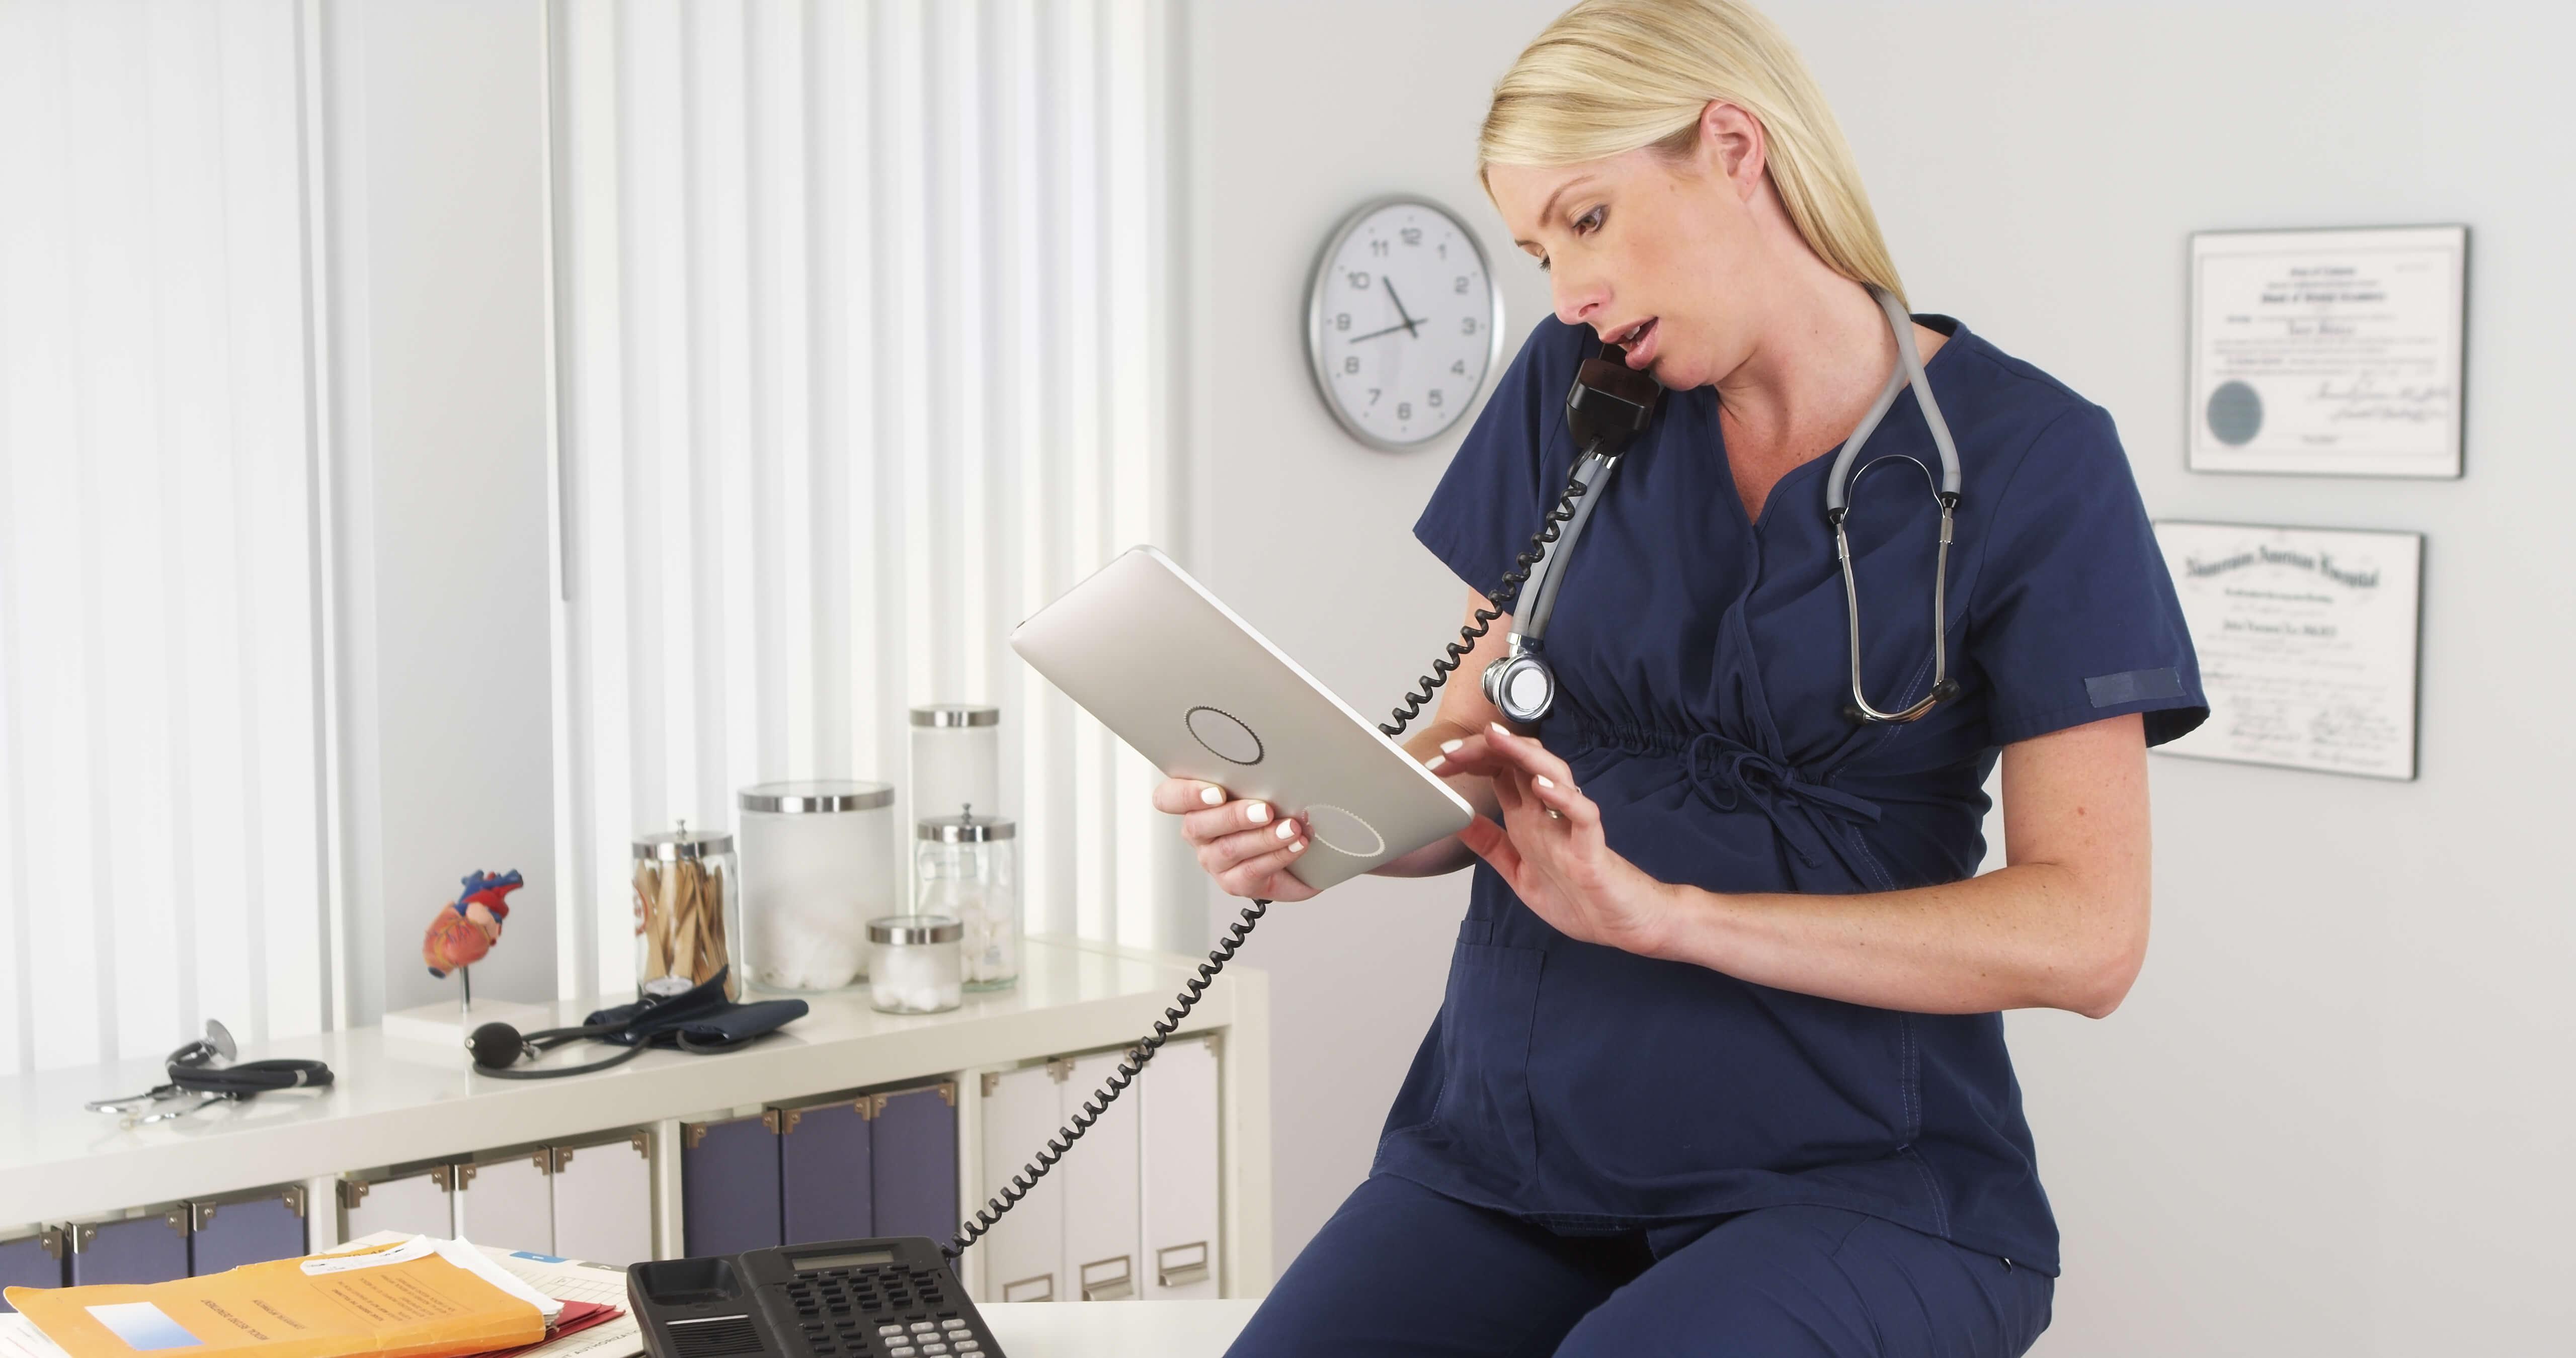 Pregnant Nurse at work